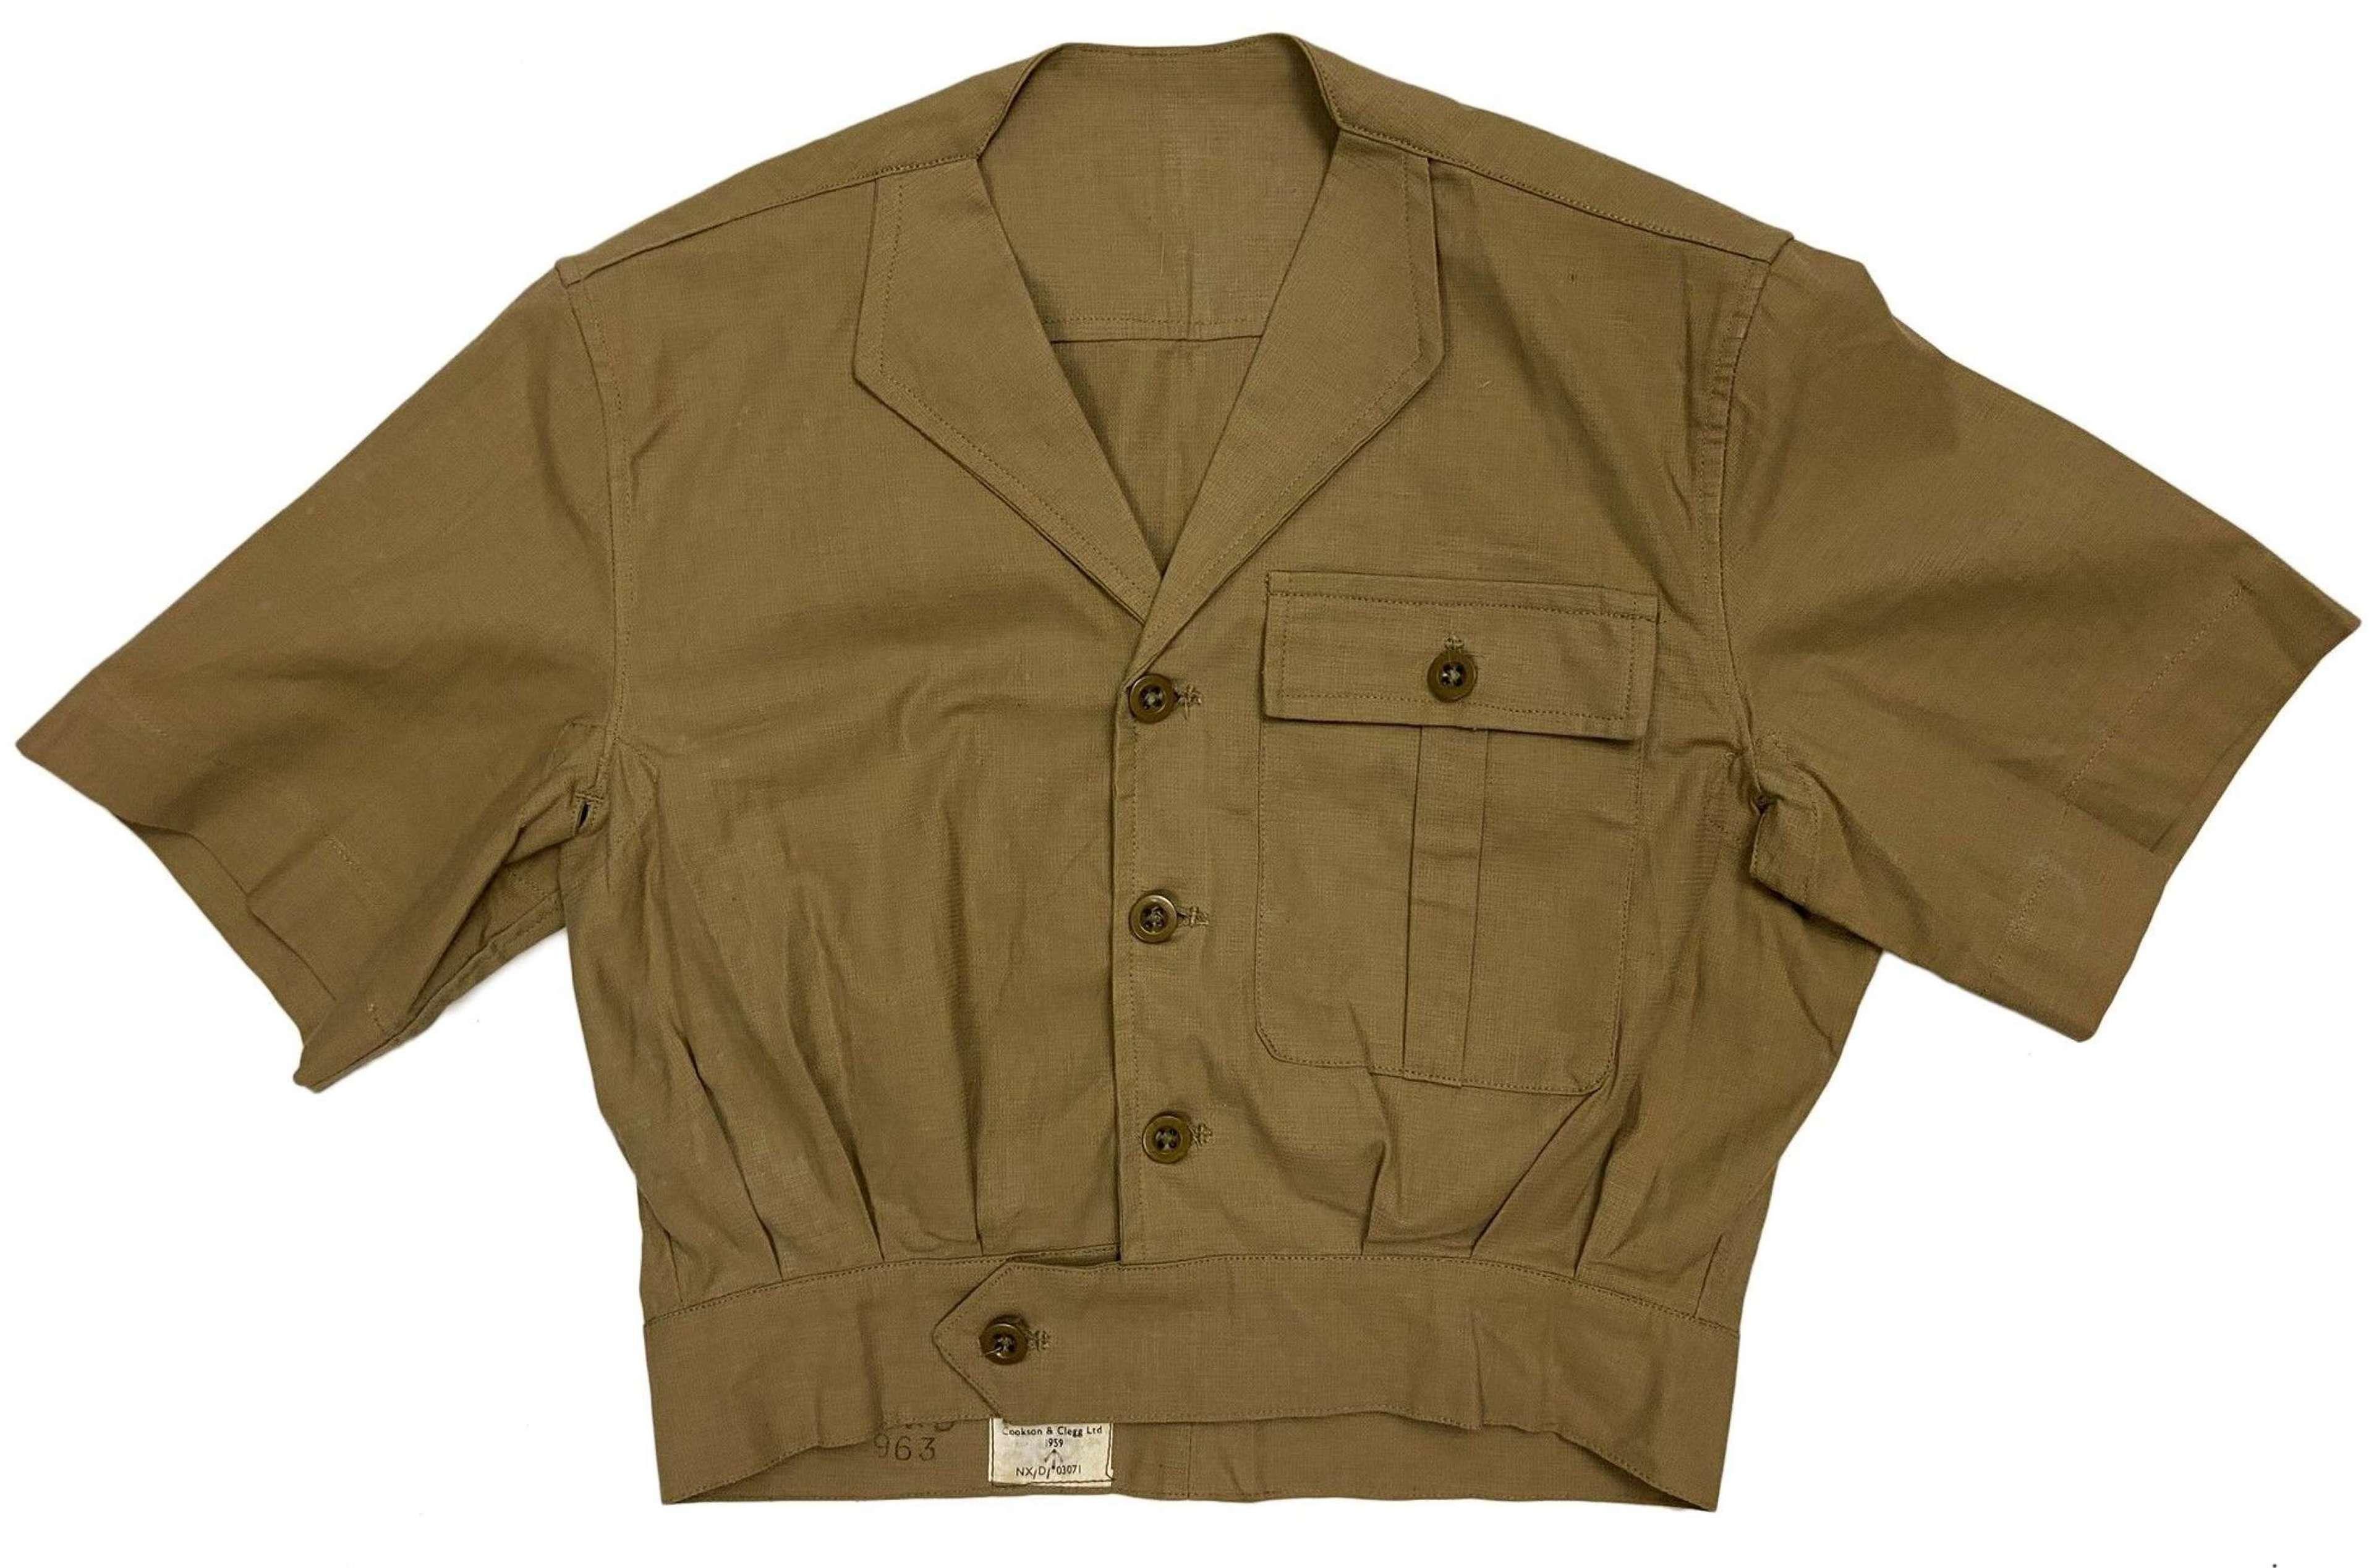 Original 1959 Dated RAF Khaki Drill Combination Suit Jacket - Size 2